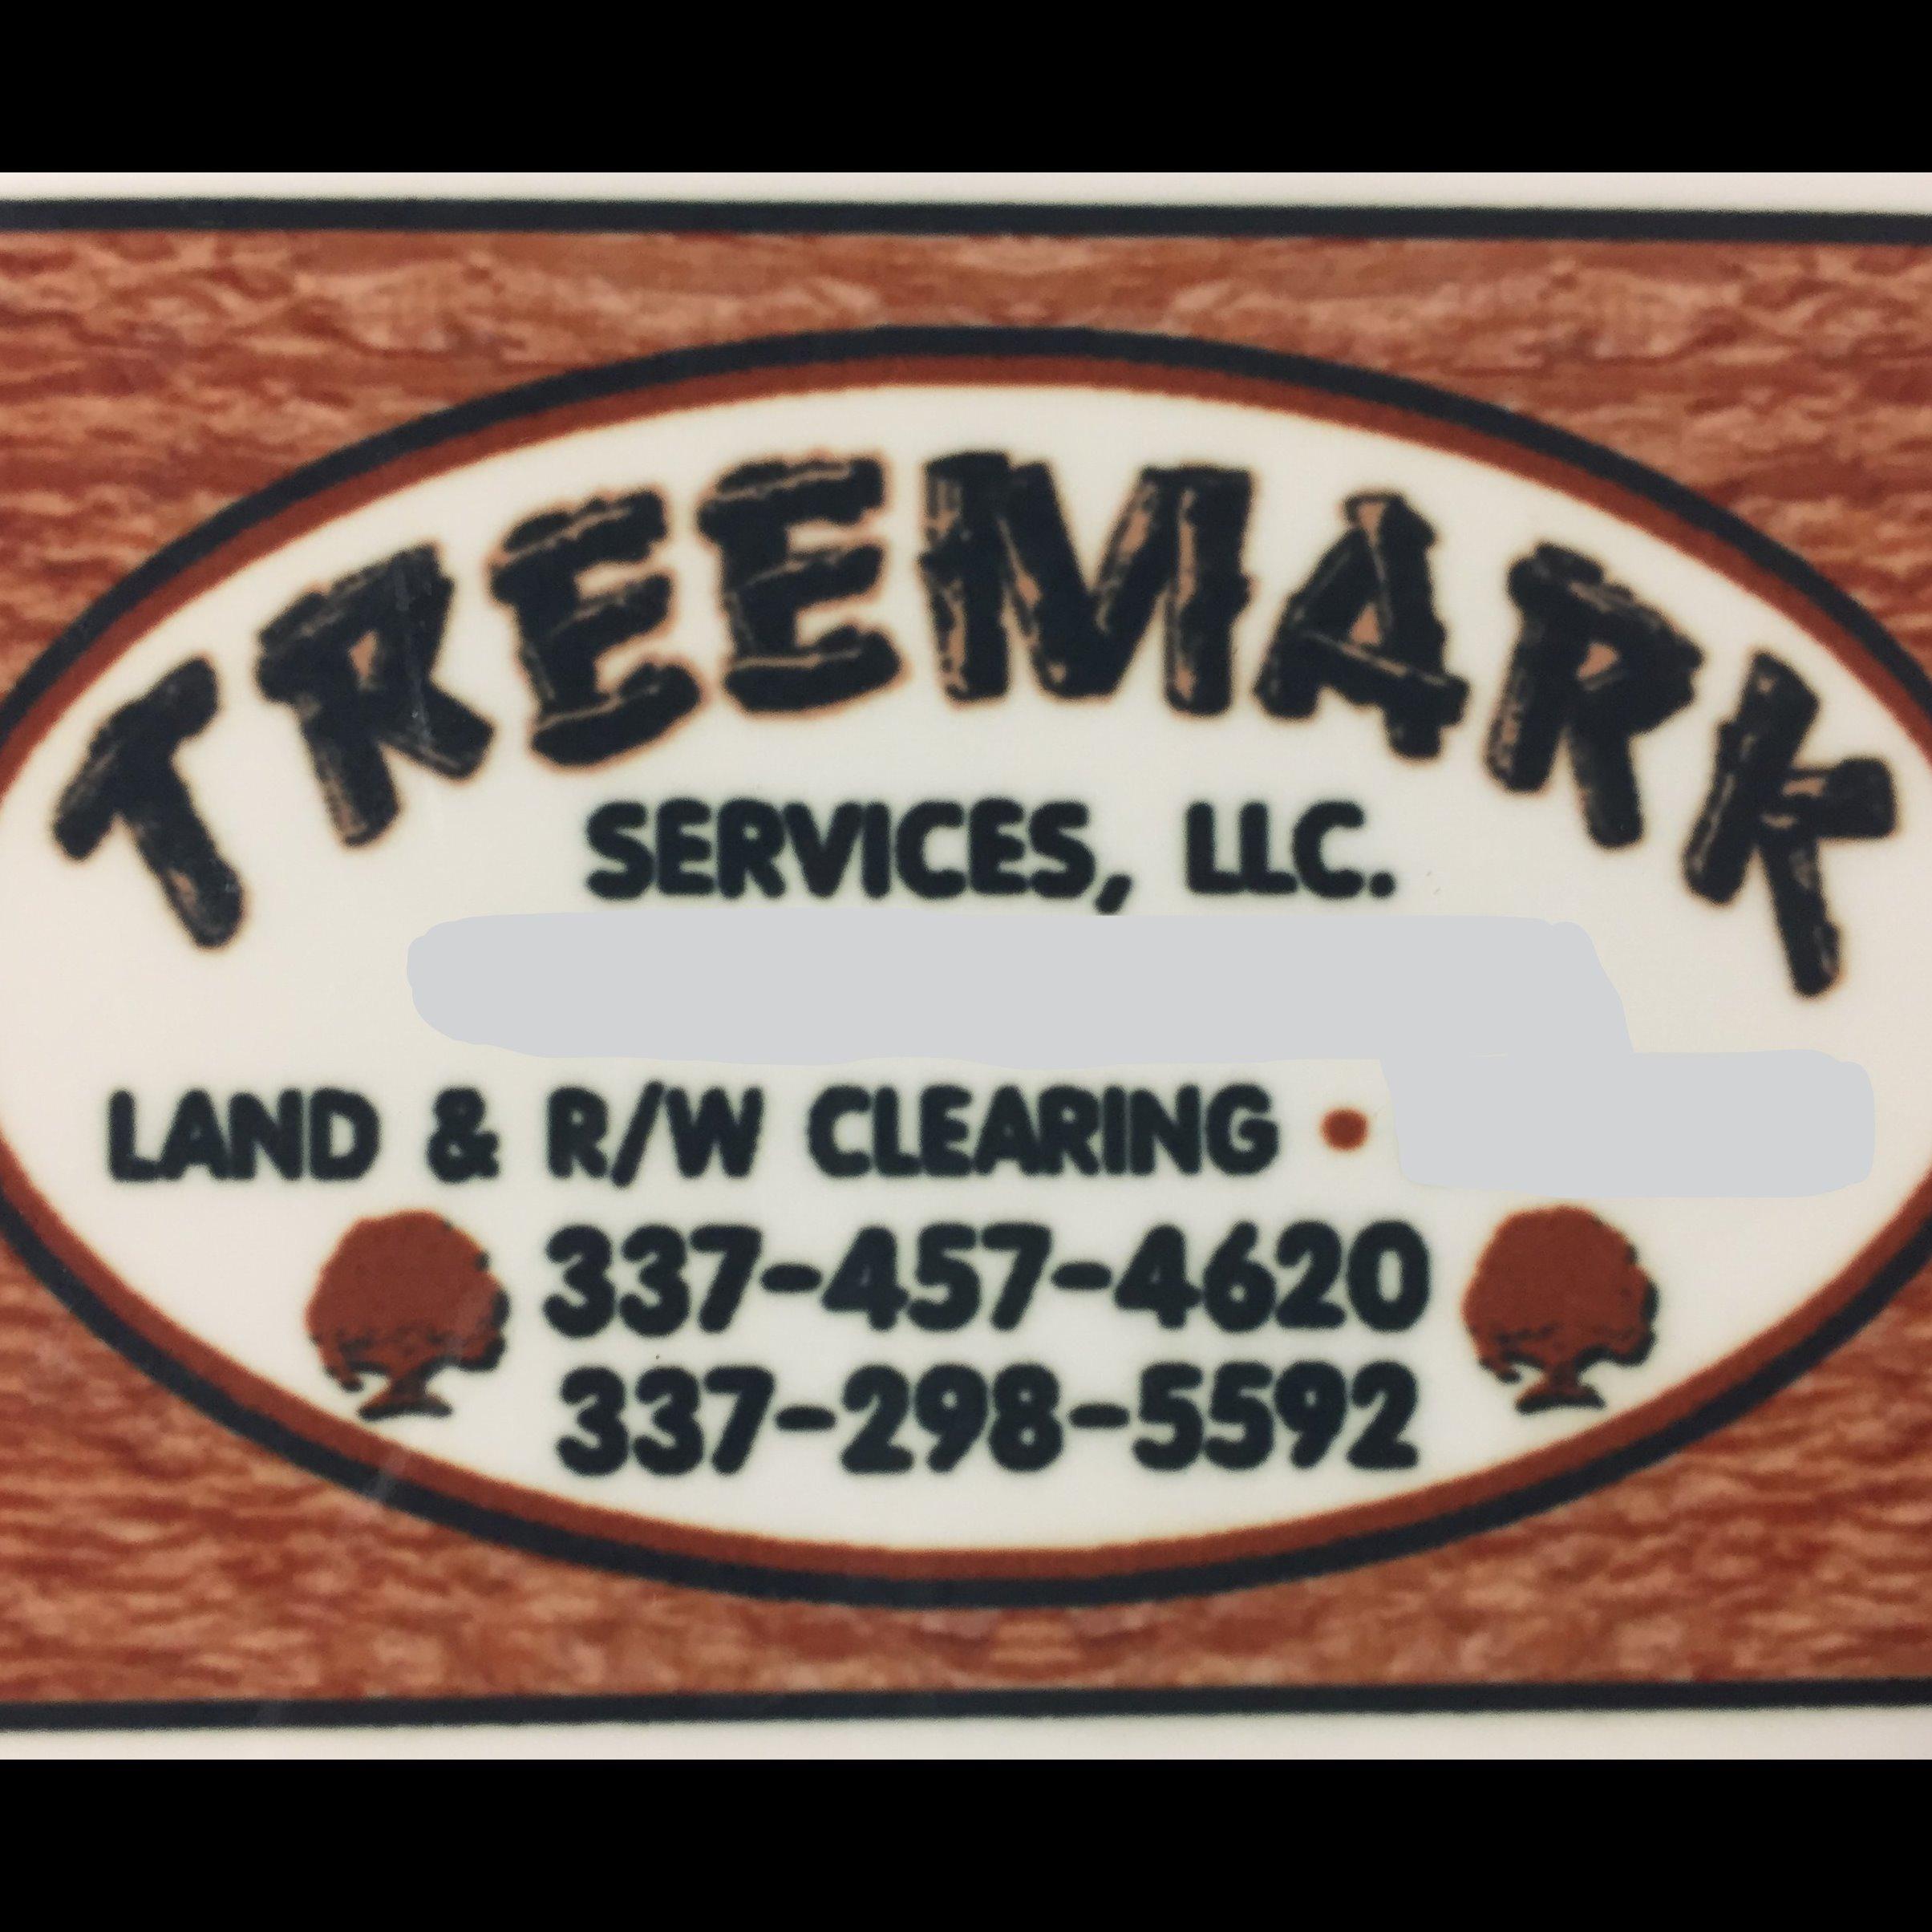 Treemark Services image 10